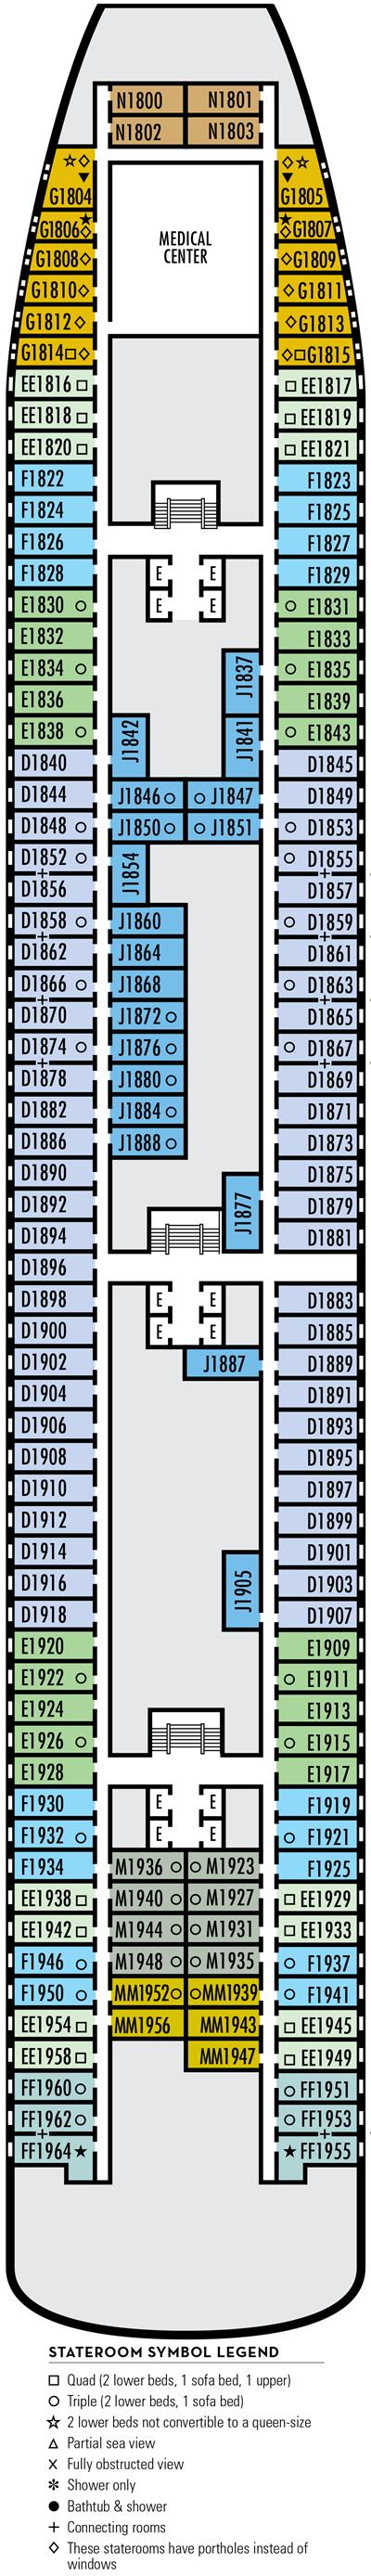 Deck 1 - MS Zaandam by HAL